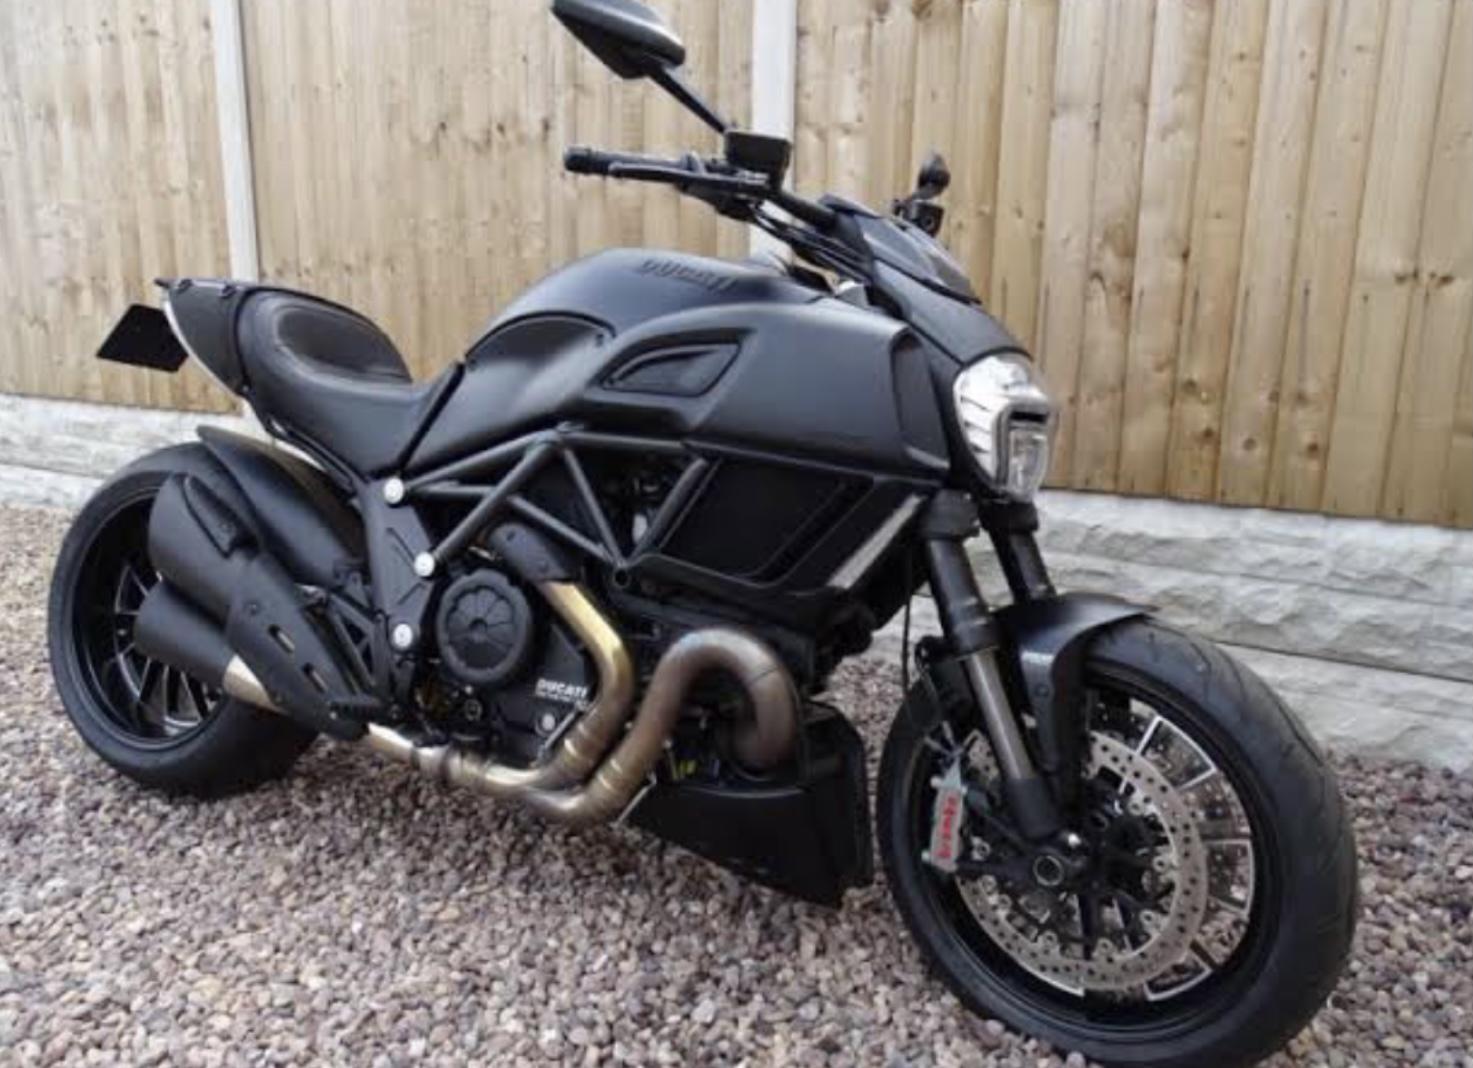 Ducati diavel 2017